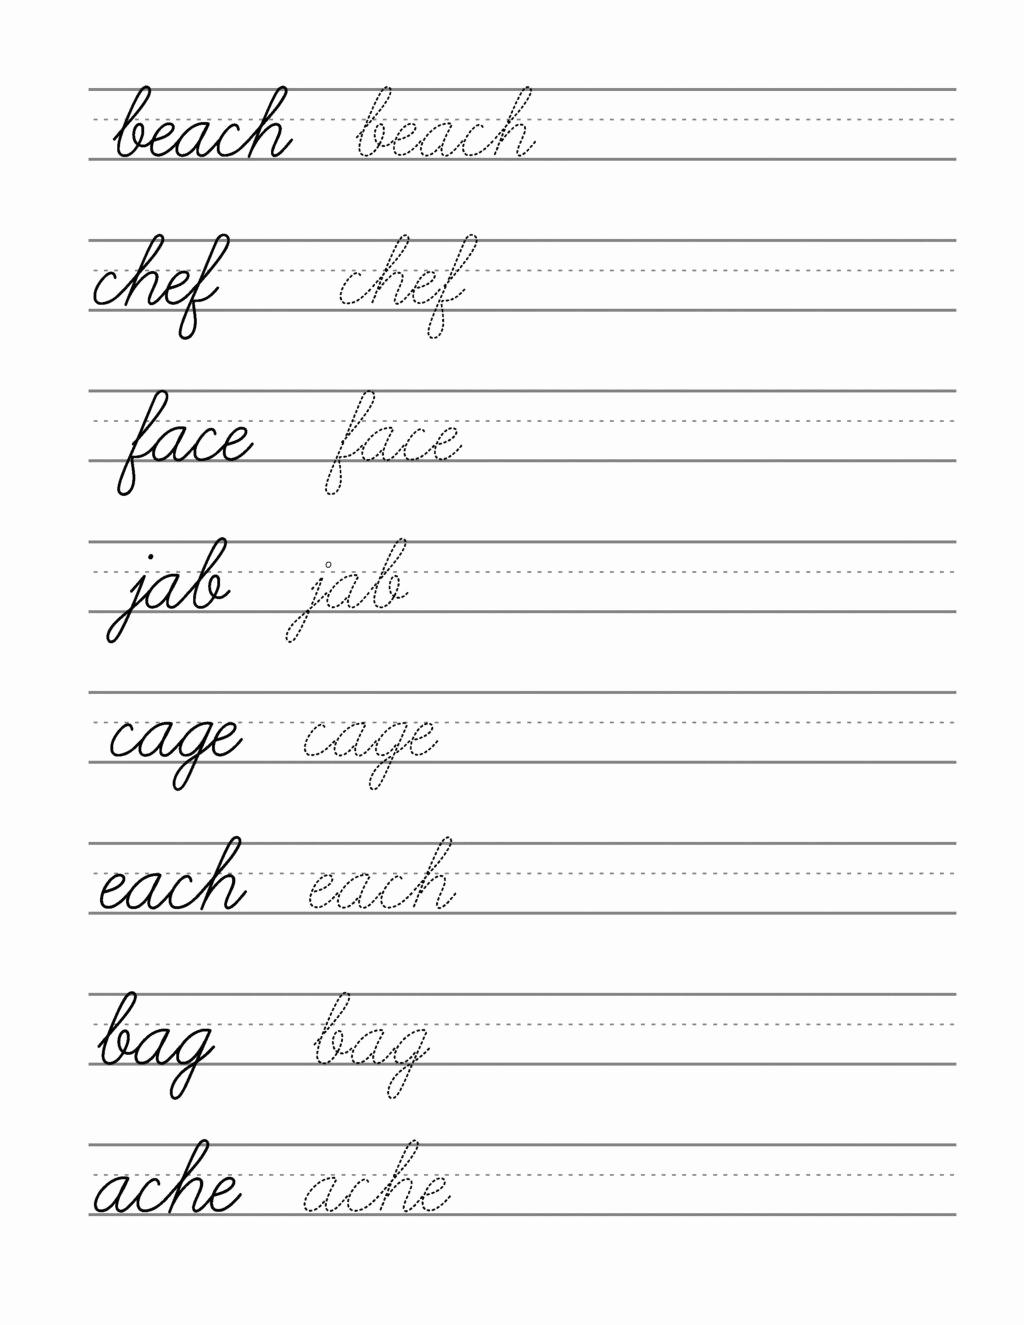 Cursive Alphabet Worksheets Pdf Unique Cursive Writing Tracing Worksheets Pdf